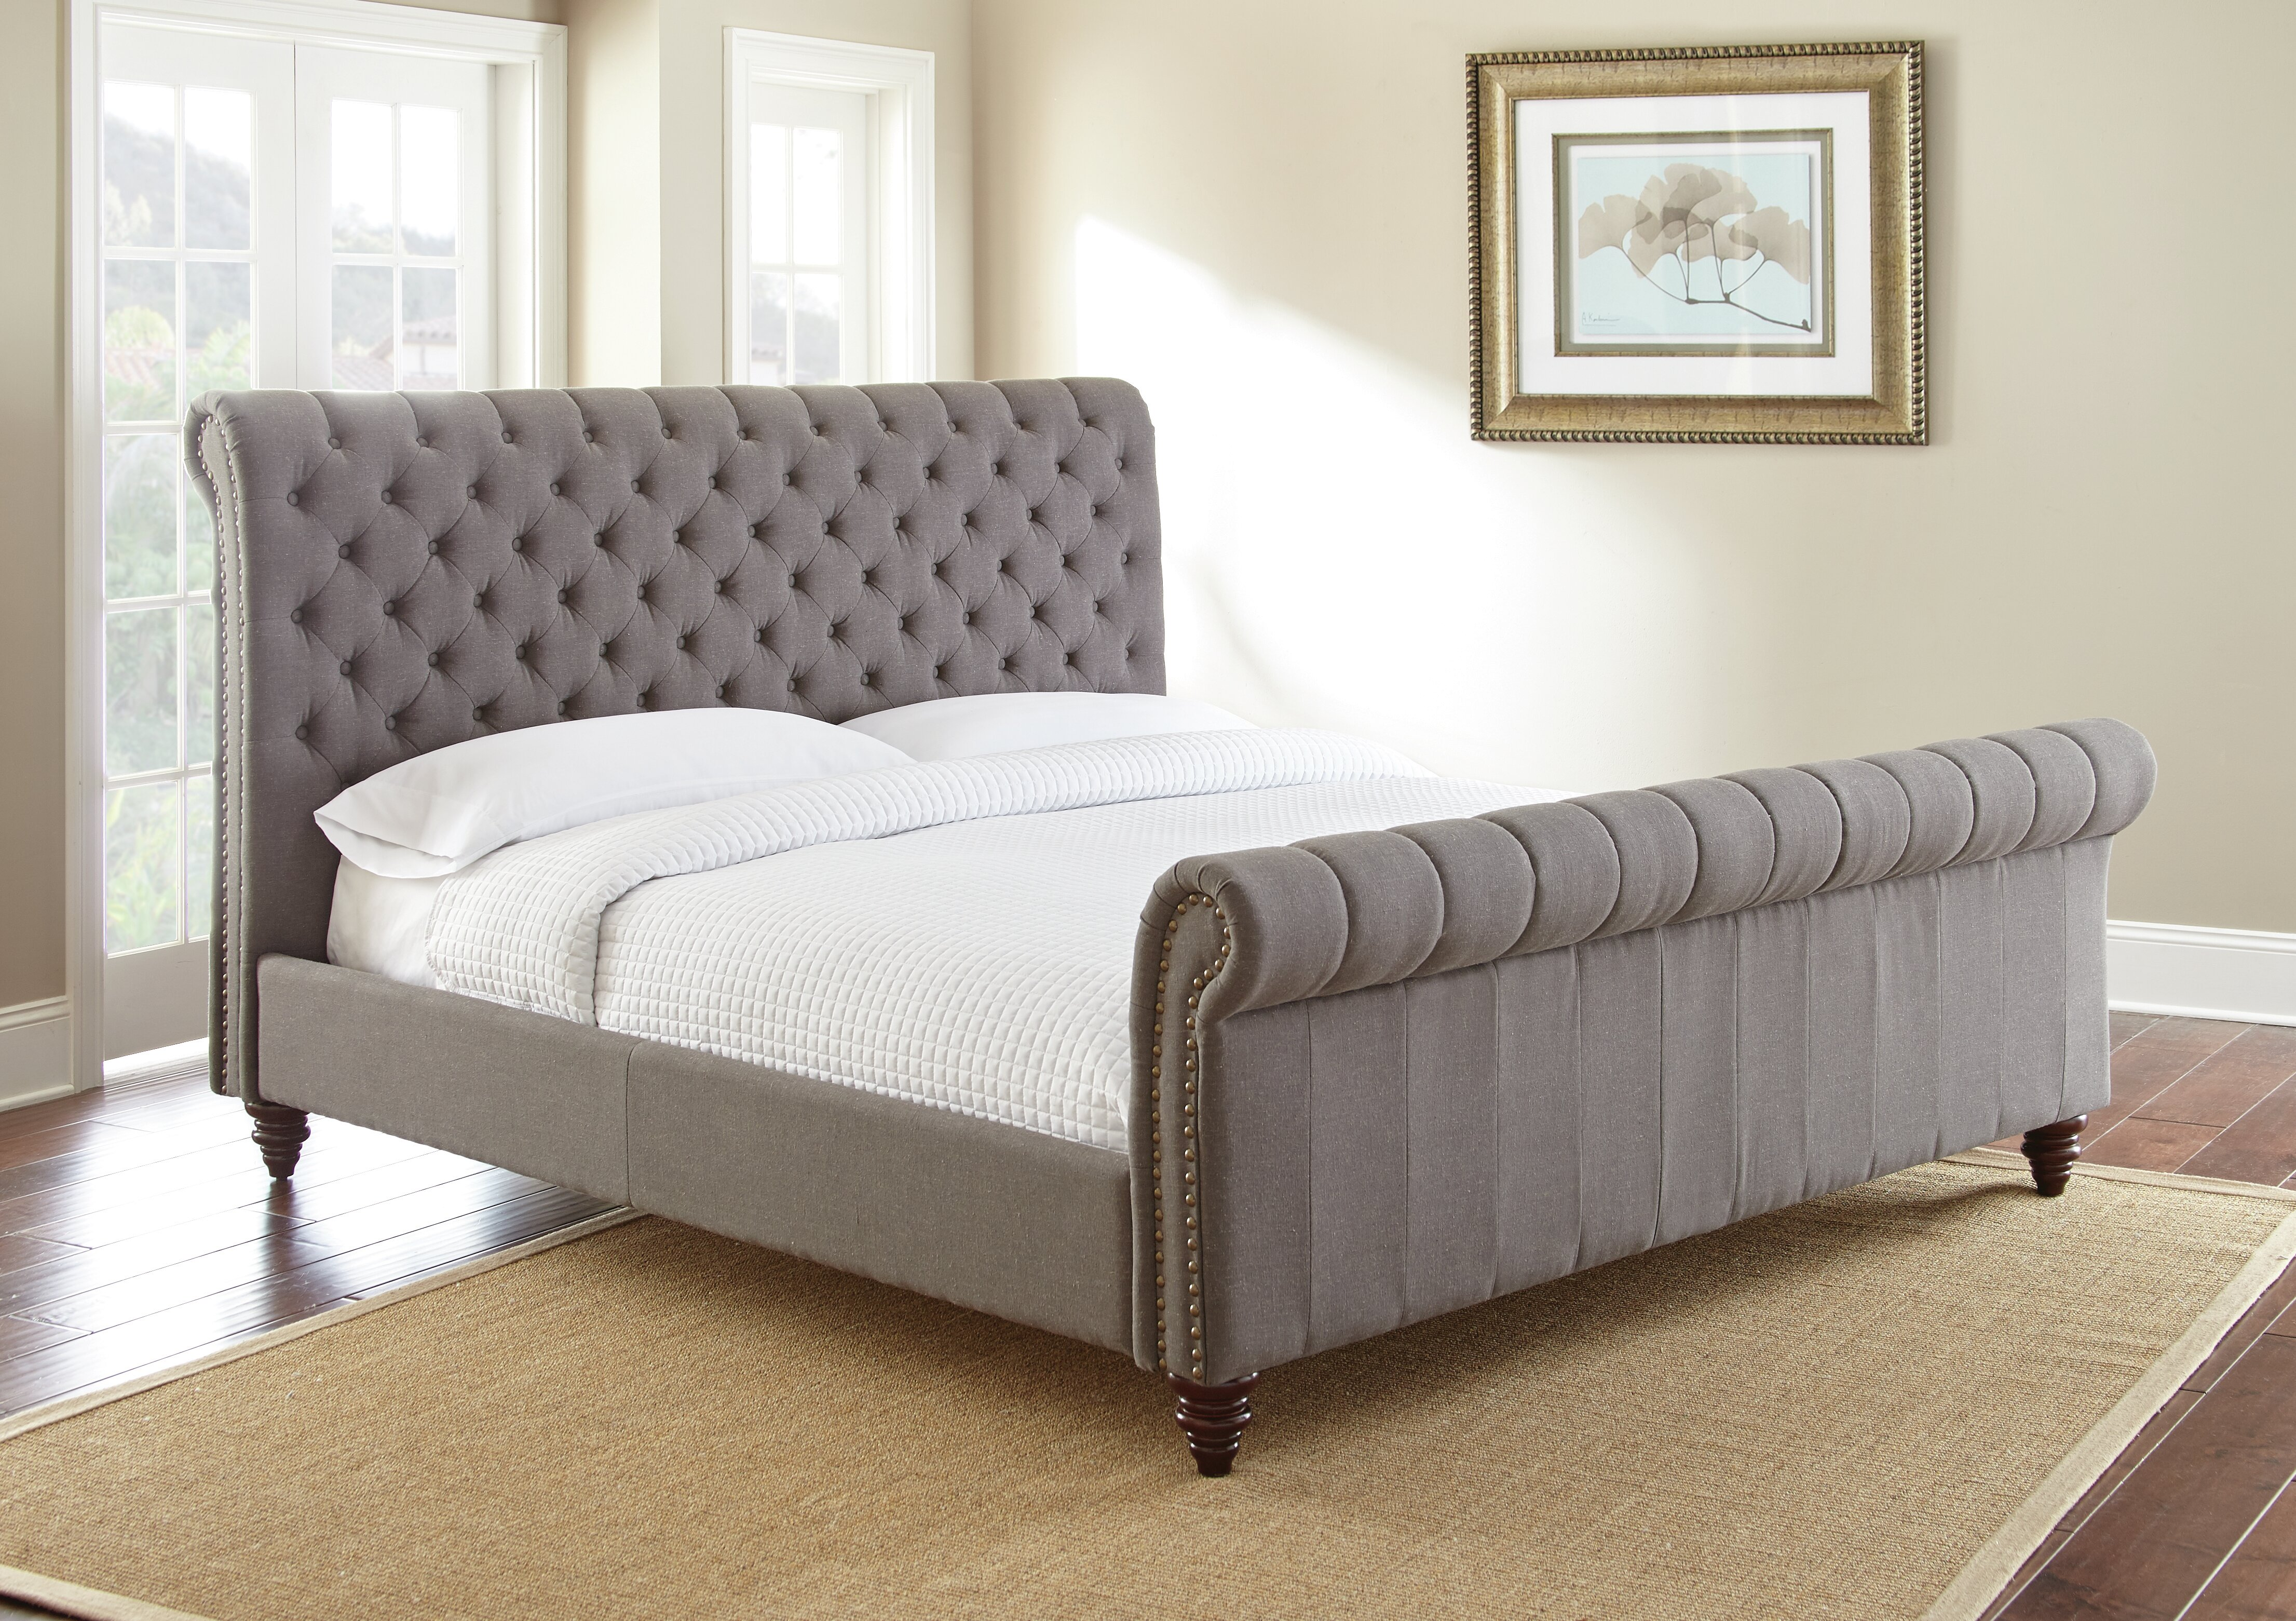 Tufted upholstered sleigh bed Ashley Wayfair Darby Home Co Karsten Upholstered Sleigh Bed Reviews Wayfair